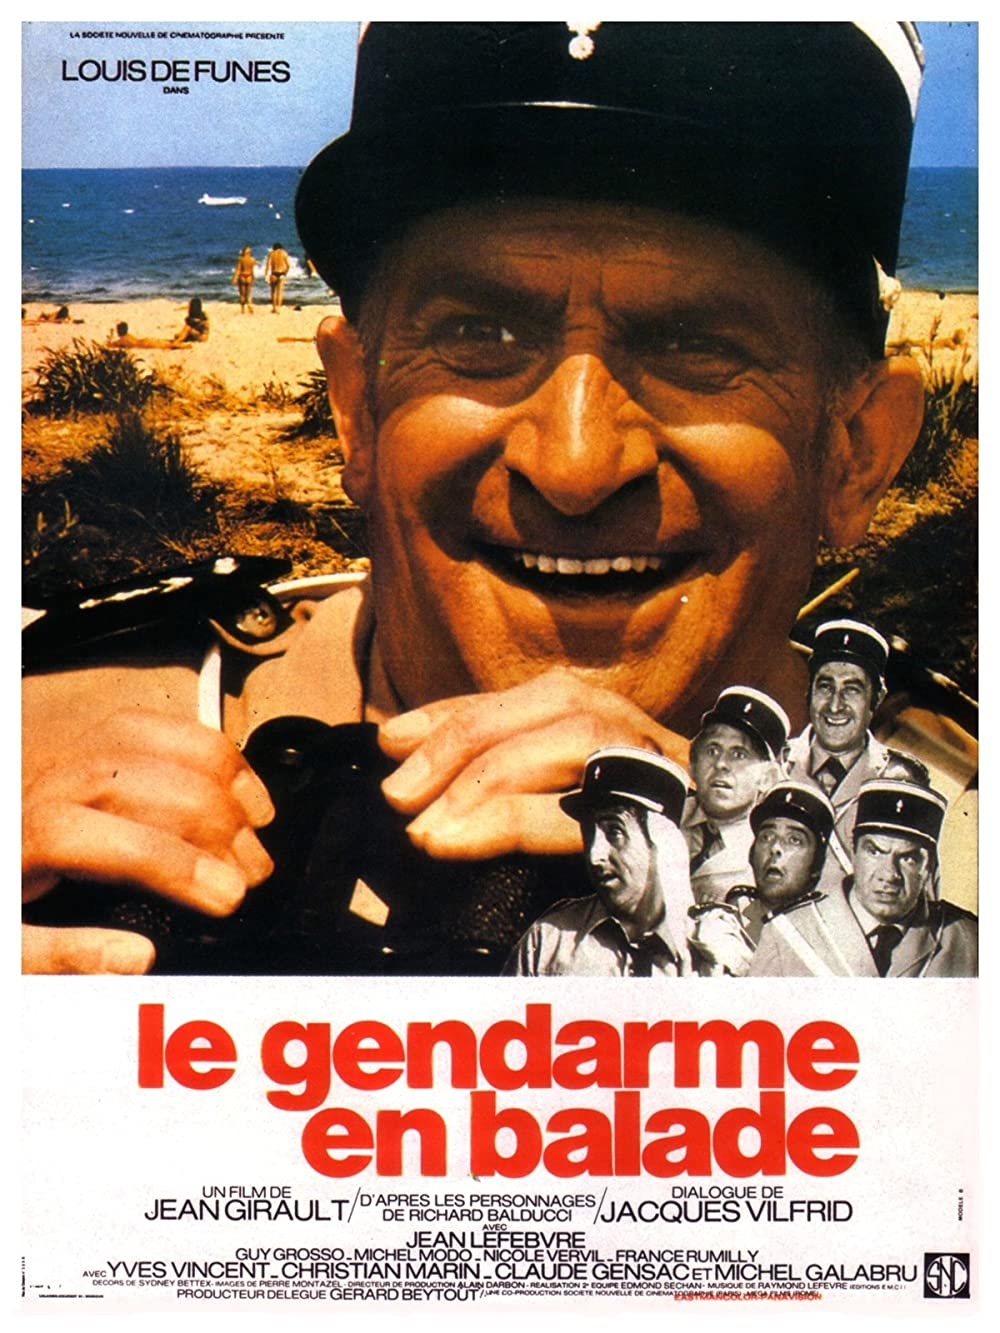 مشاهدة فيلم Le gendarme en balade (1970) مترجم